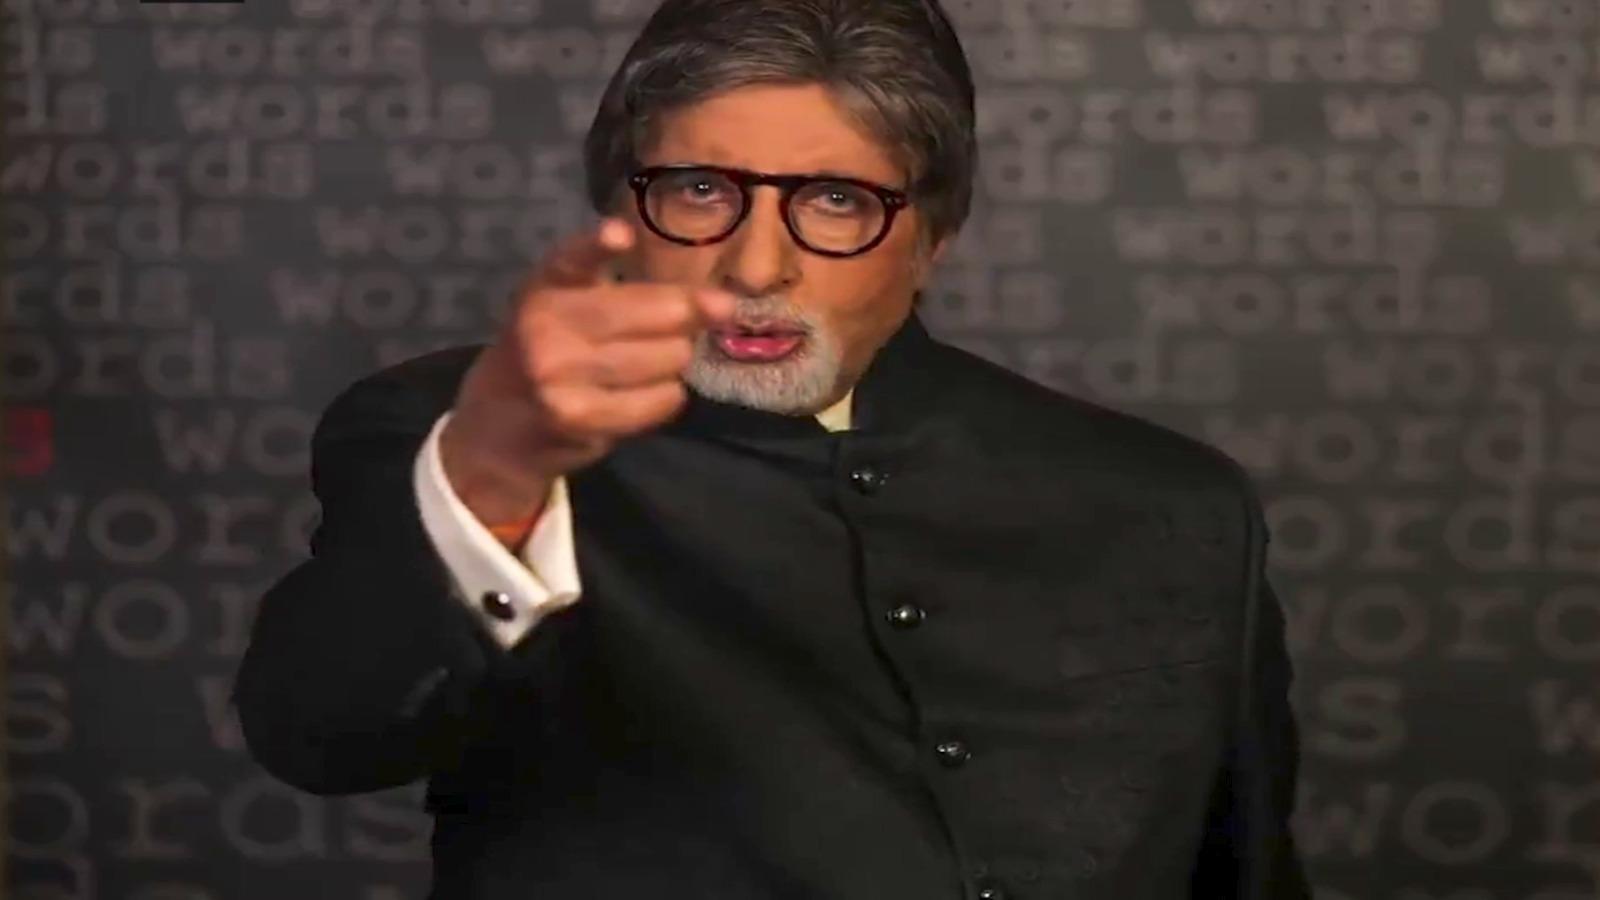 amitabh-bachchan-recites-late-father-harivansh-rai-bachchans-motivational-poem-to-boost-peoples-morale-amid-covid-19-crisis